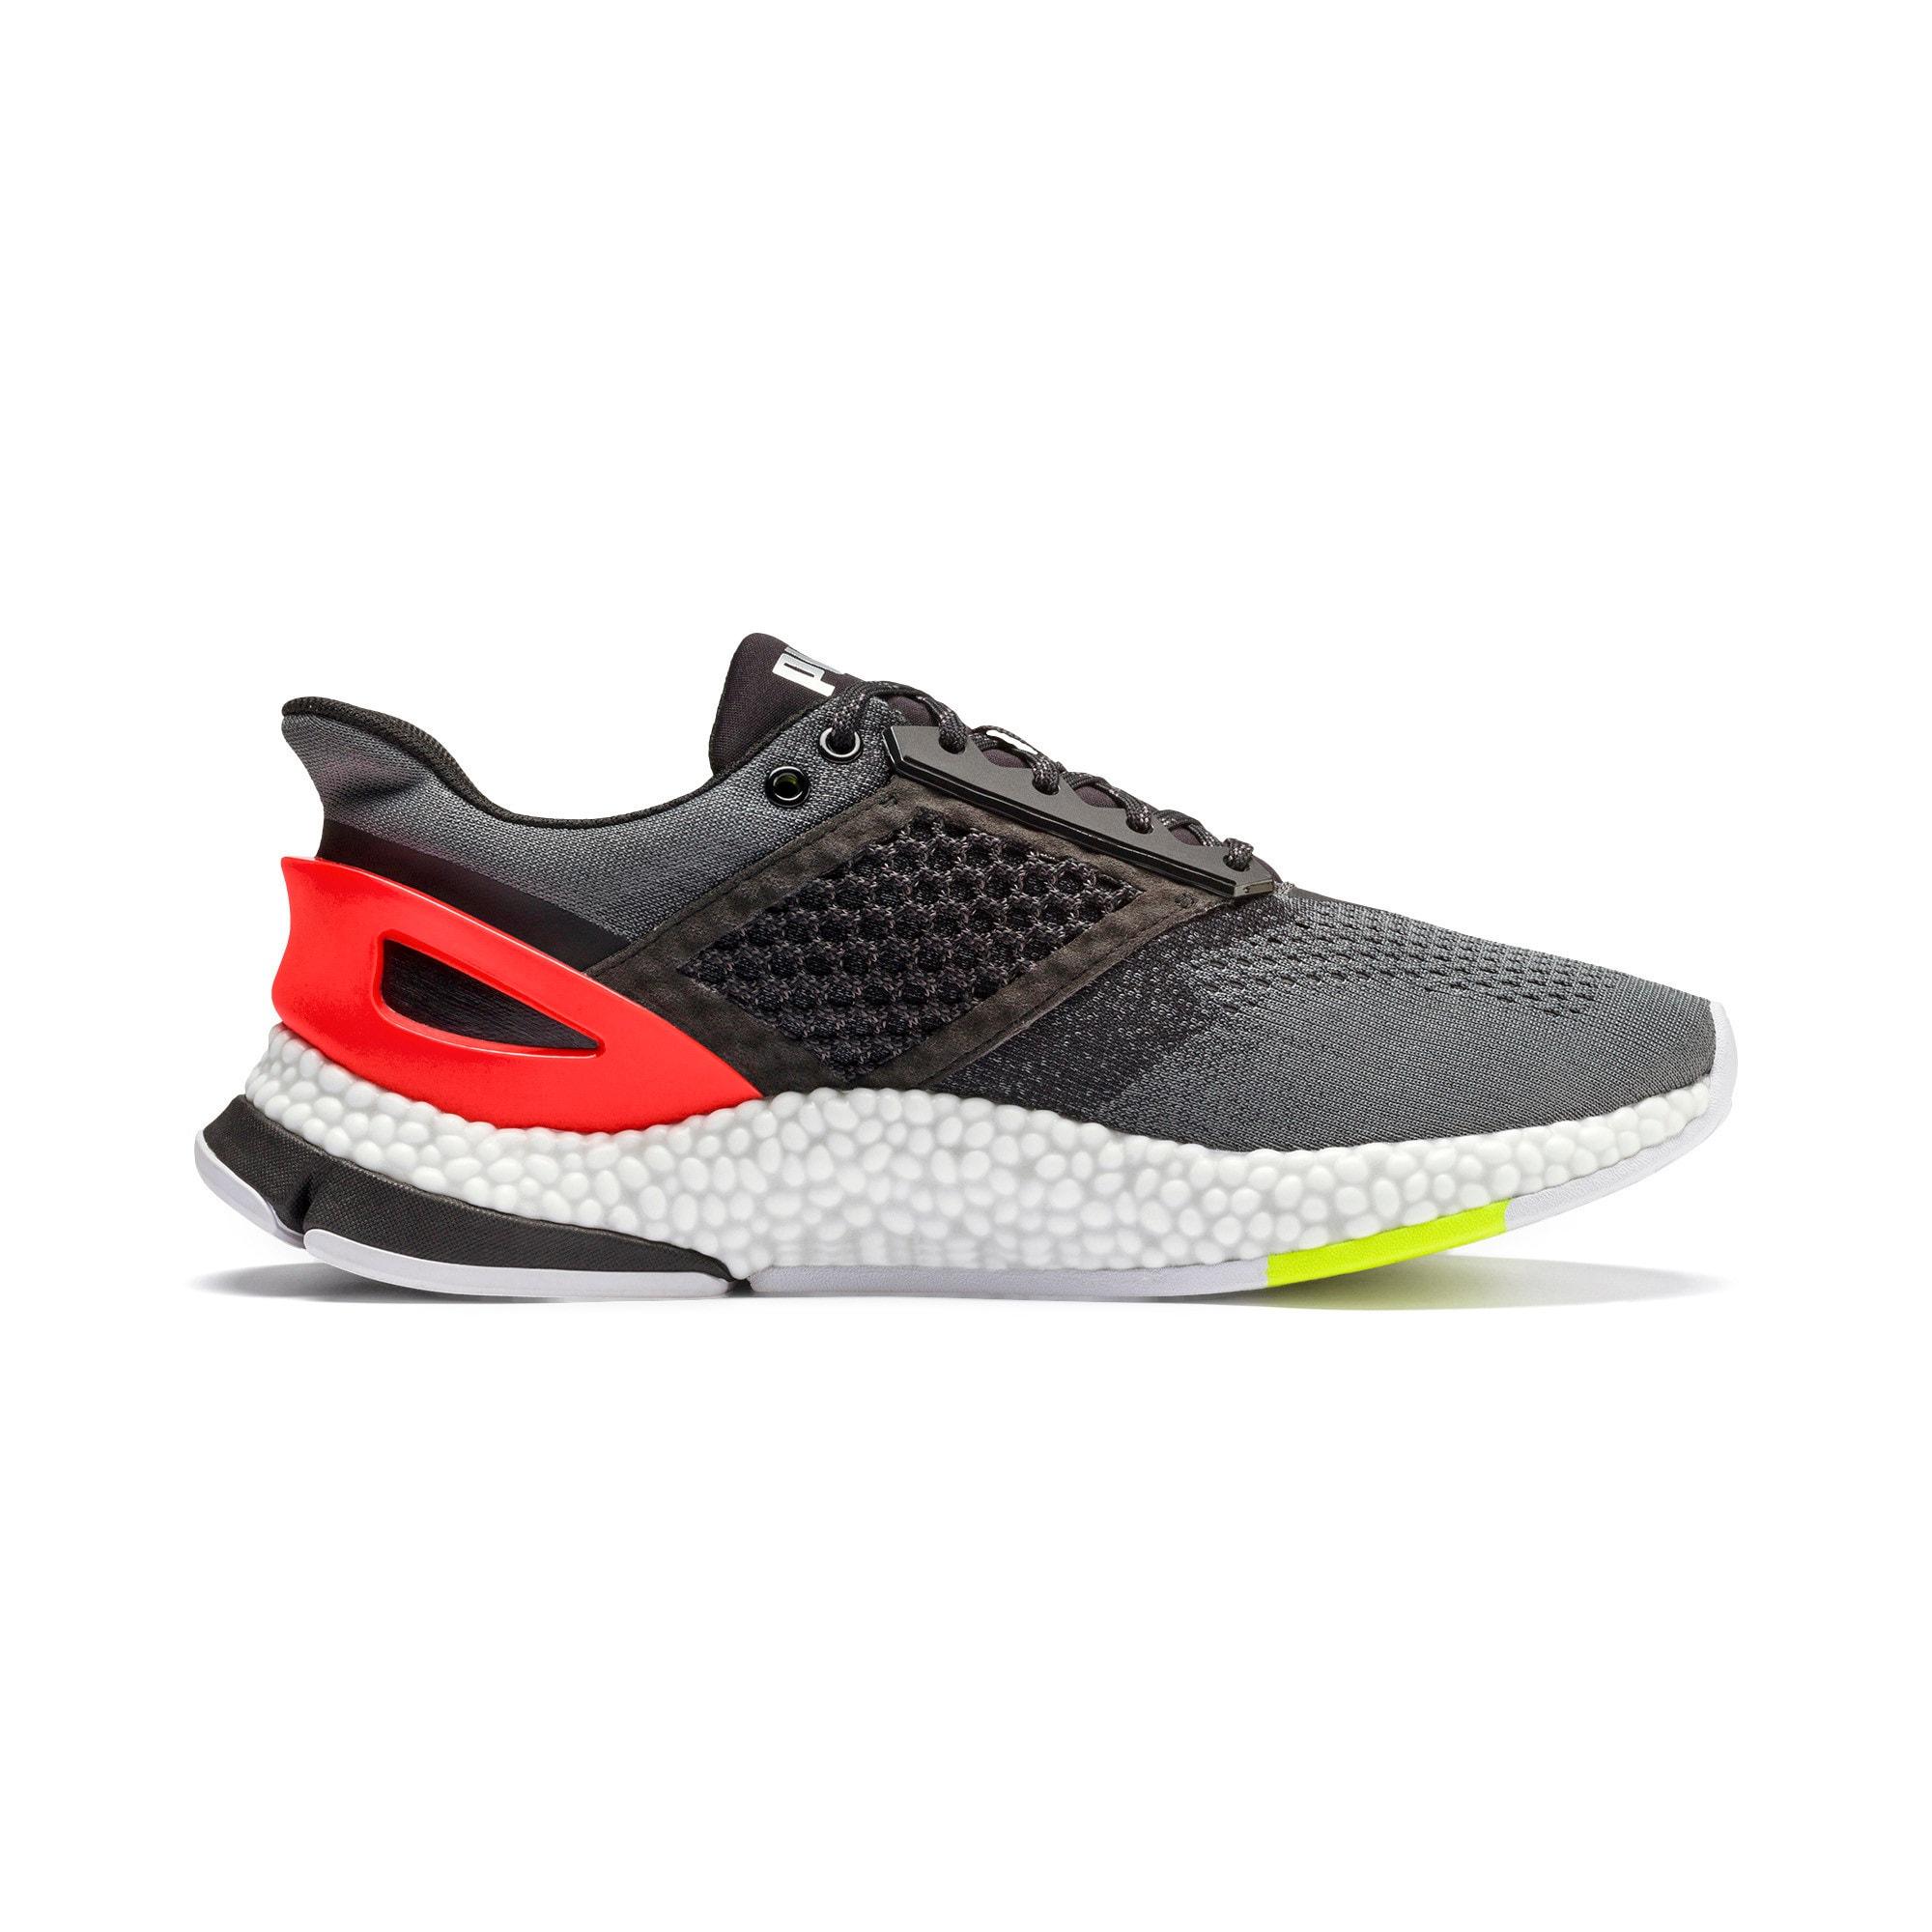 Thumbnail 6 of HYBRID NETFIT Astro Men's Running Shoes, CASTLEROCK-Puma Blck-Ngy Red, medium